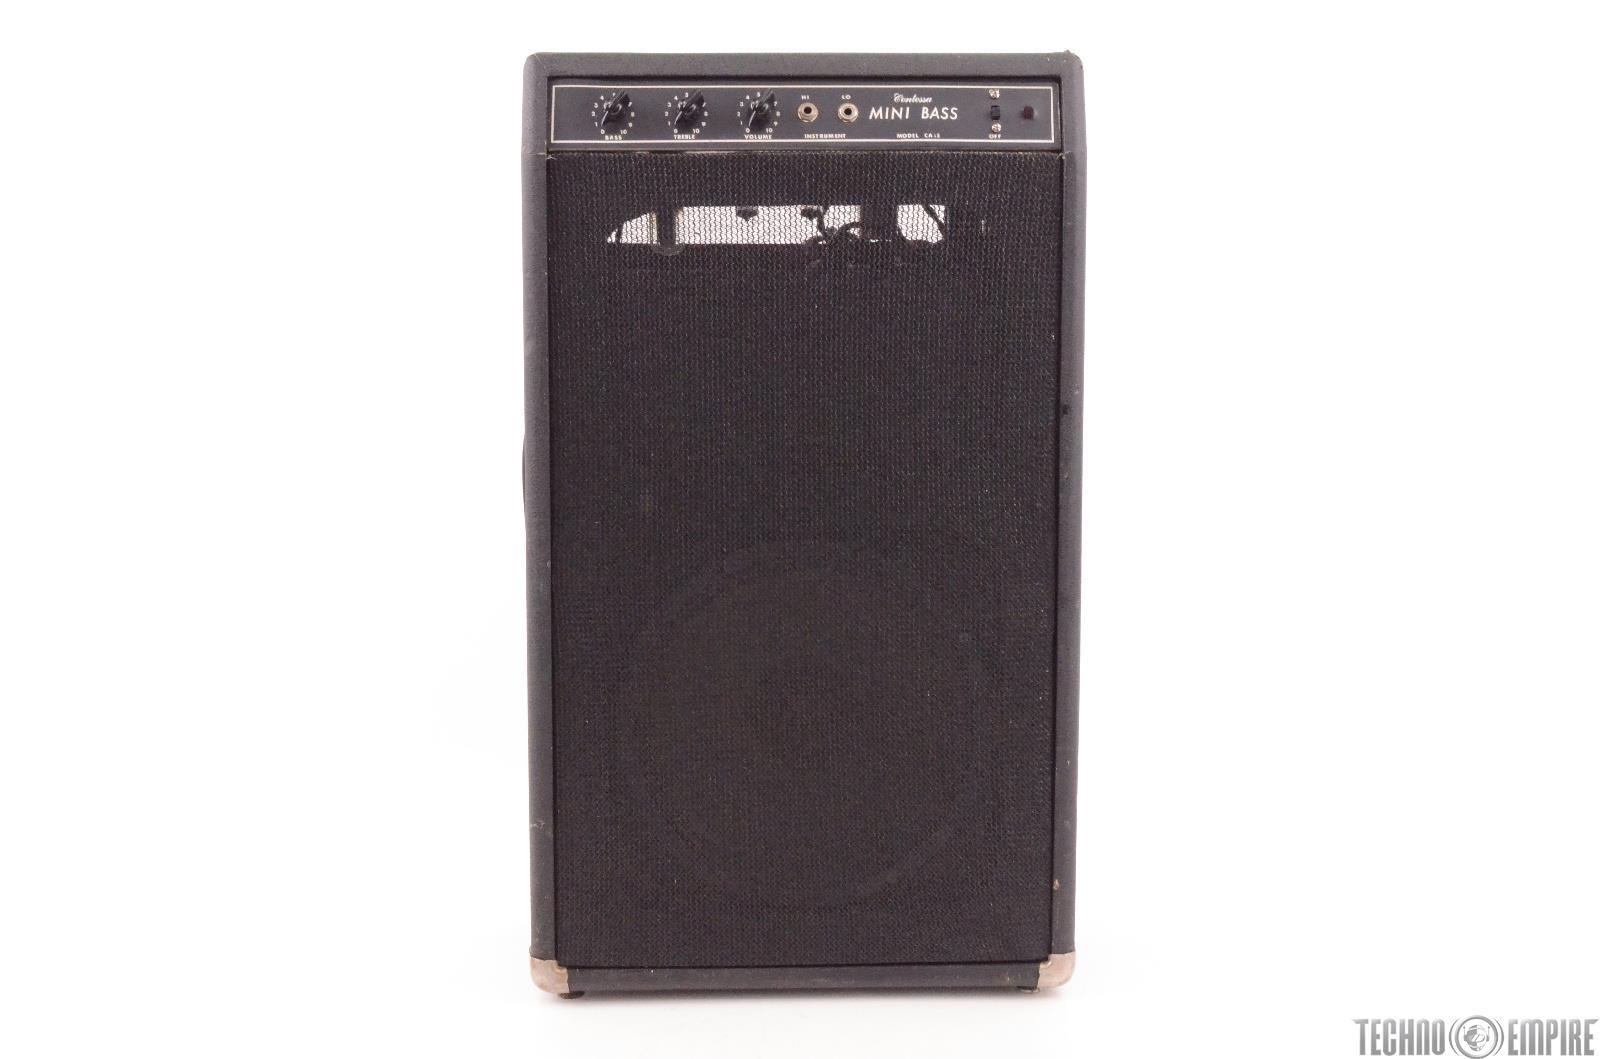 "CONTESSA CA-15 1x15"" Mini Bass Combo Tube Amplifier CA-10 Bartell Hohner #27436"